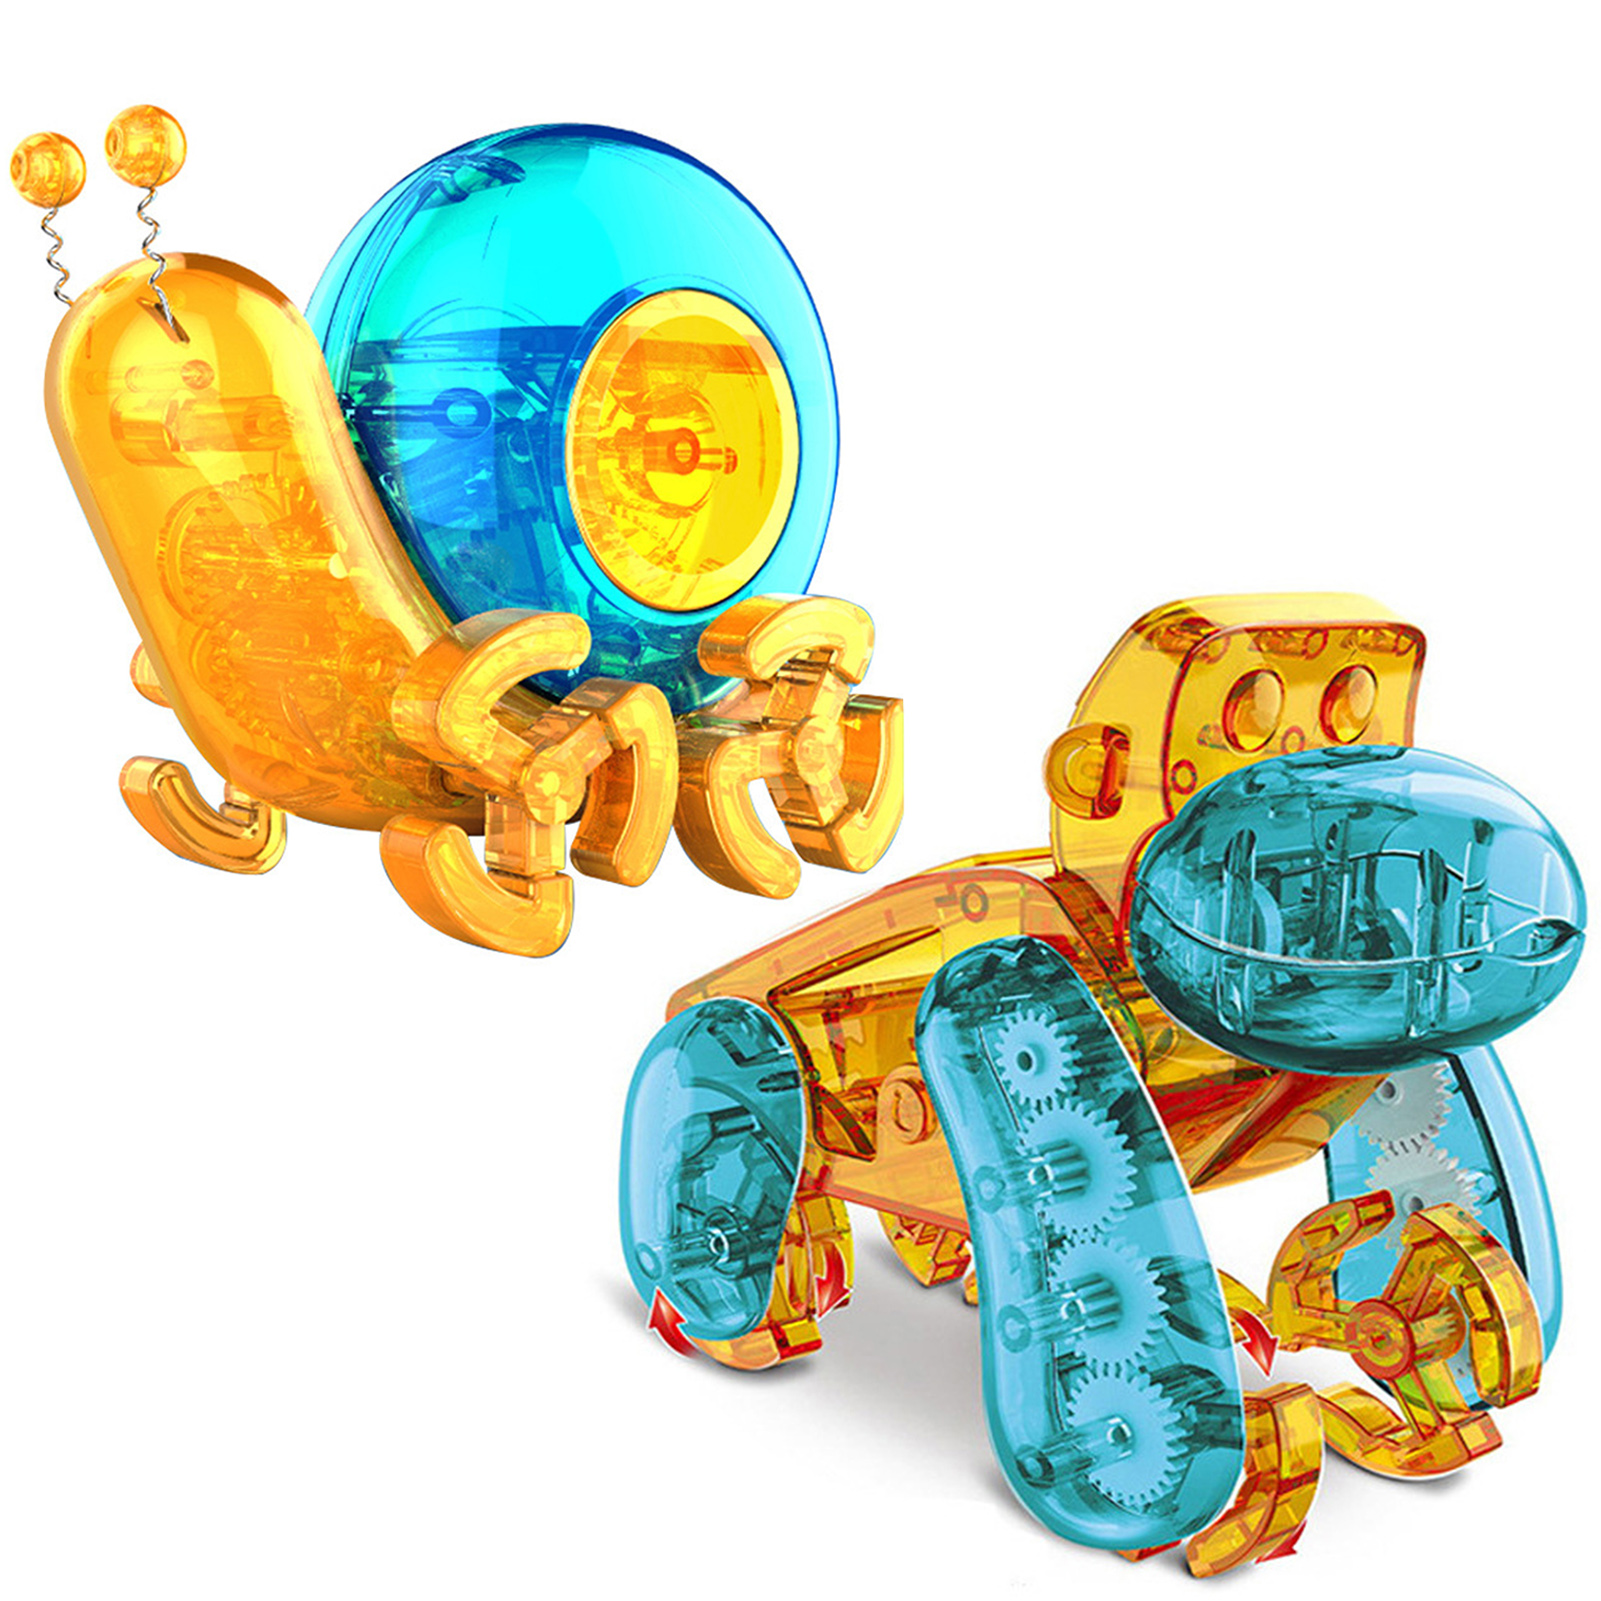 New DIY Solar Energy Self Installed Snail Chimpanzee Robot Flowerpot Scientific Experiment Educational Toy Programming Gift